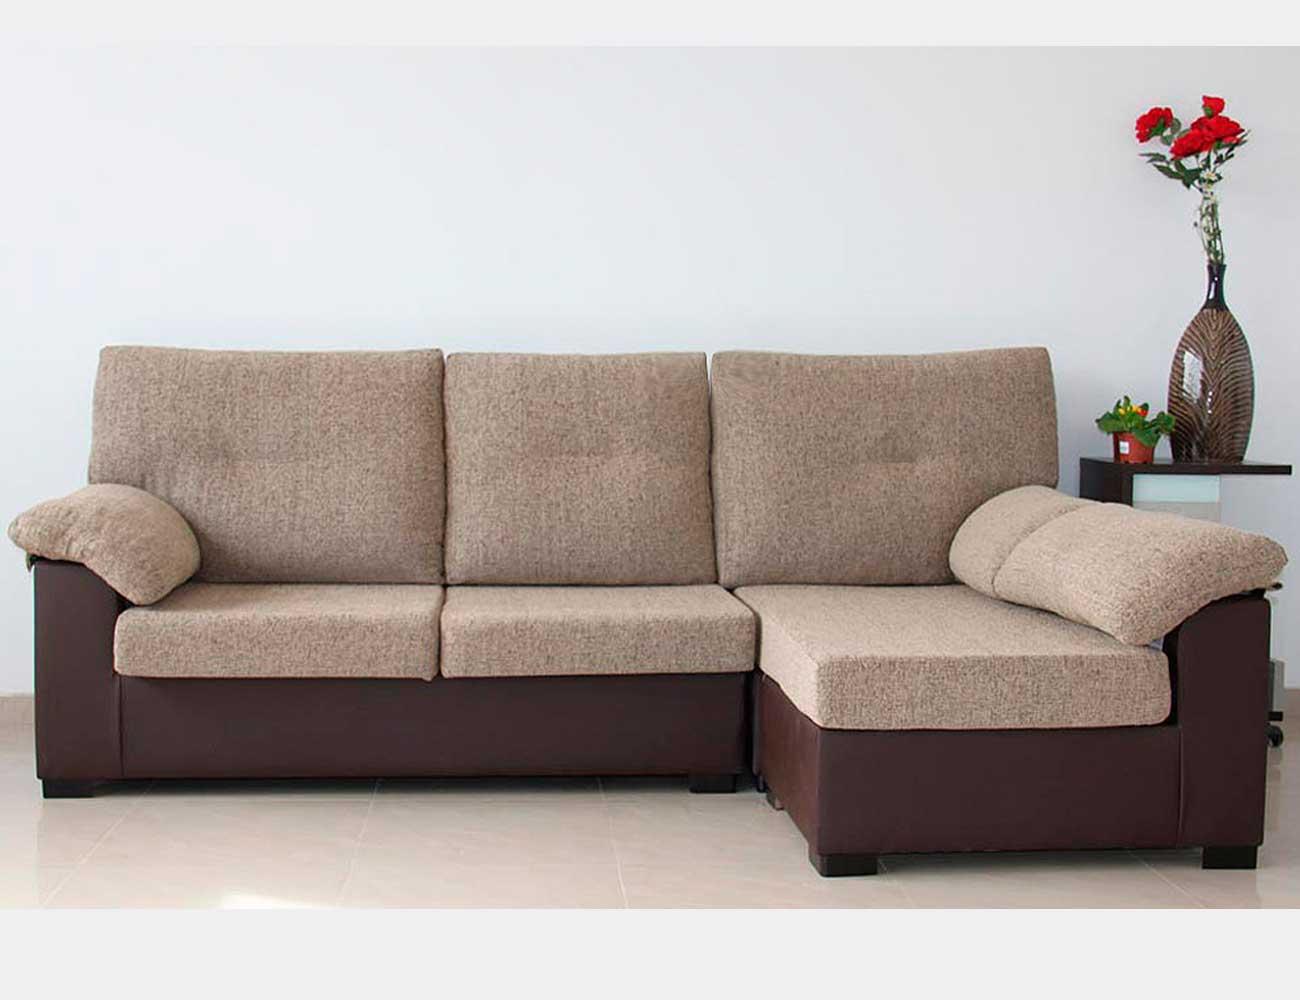 Sofa chaise longue barato4